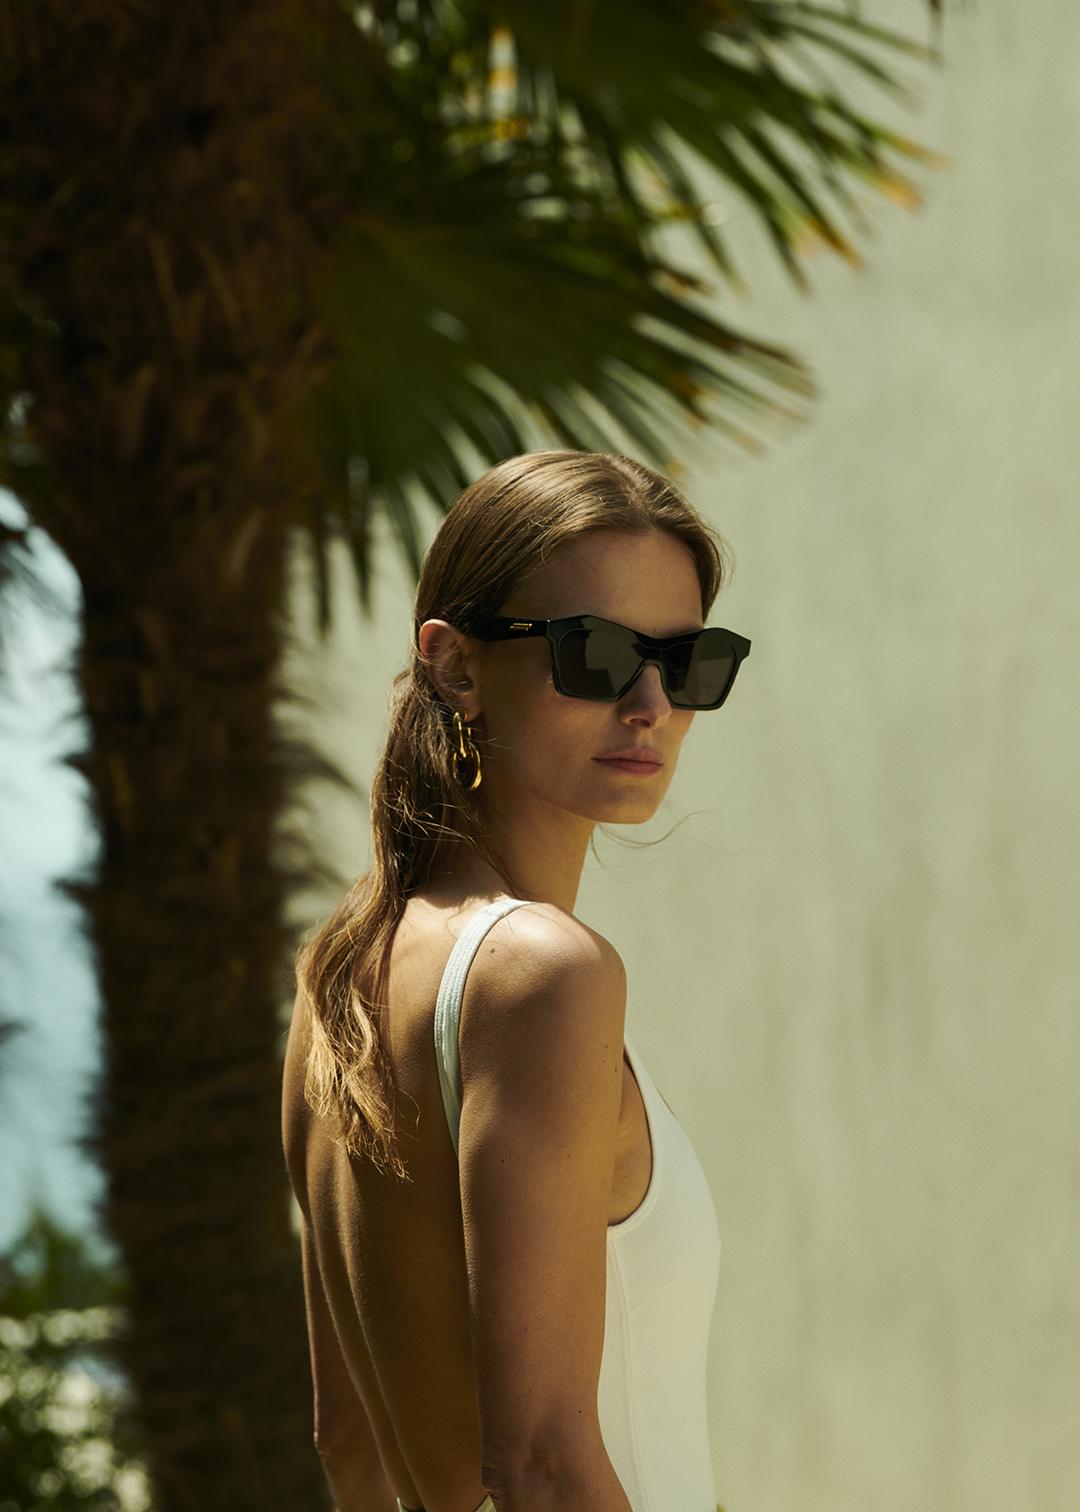 Harvey Nichols - Fashion - 8AM - Production - Marian Nachmia